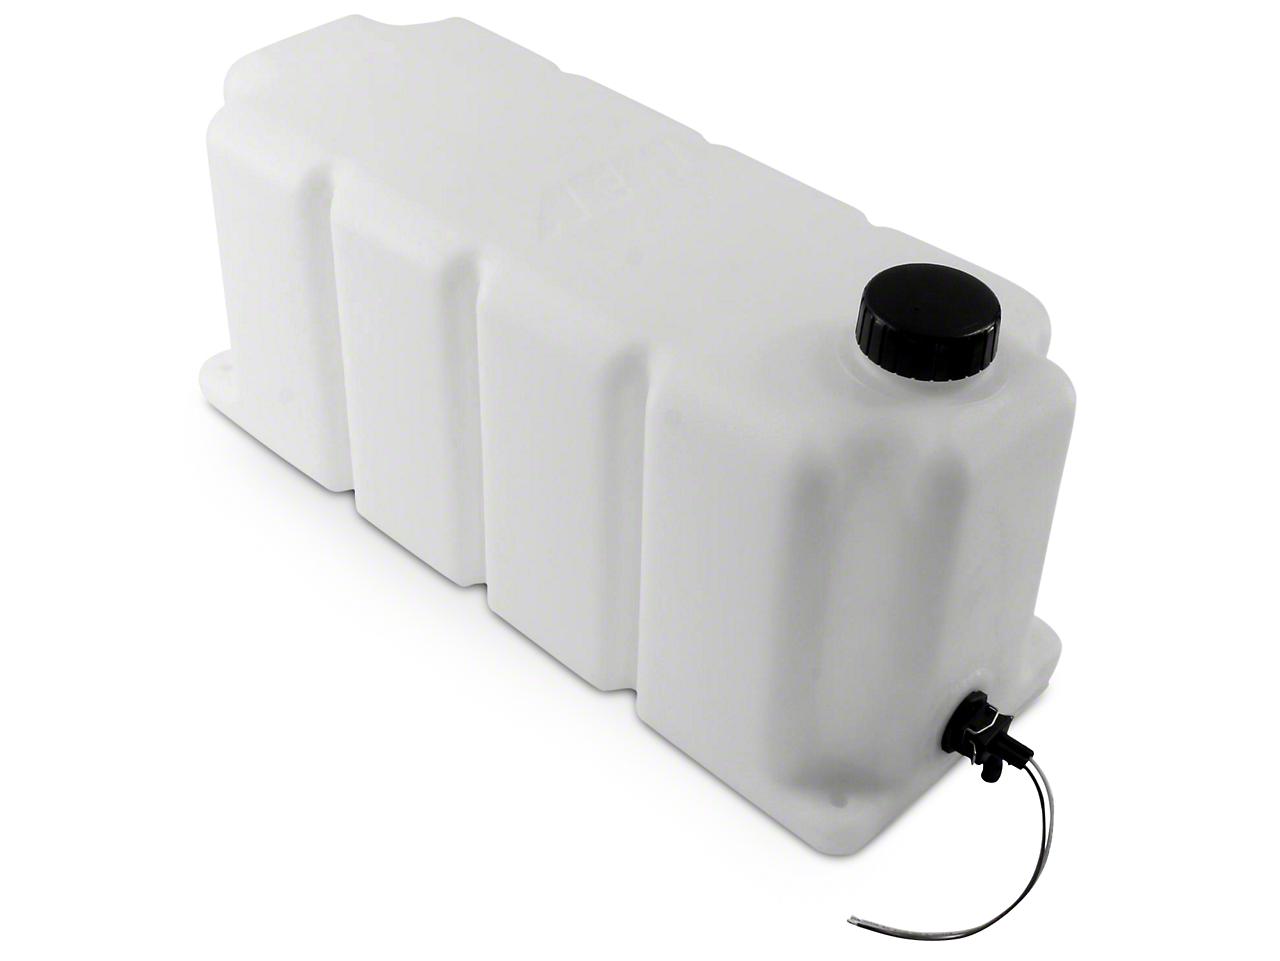 AEM Electronics V2 Water/Methanol Injection 5 Gallon Tank Kit w/ Conductive Fluid Level Sensor (07-18 Silverado 1500)